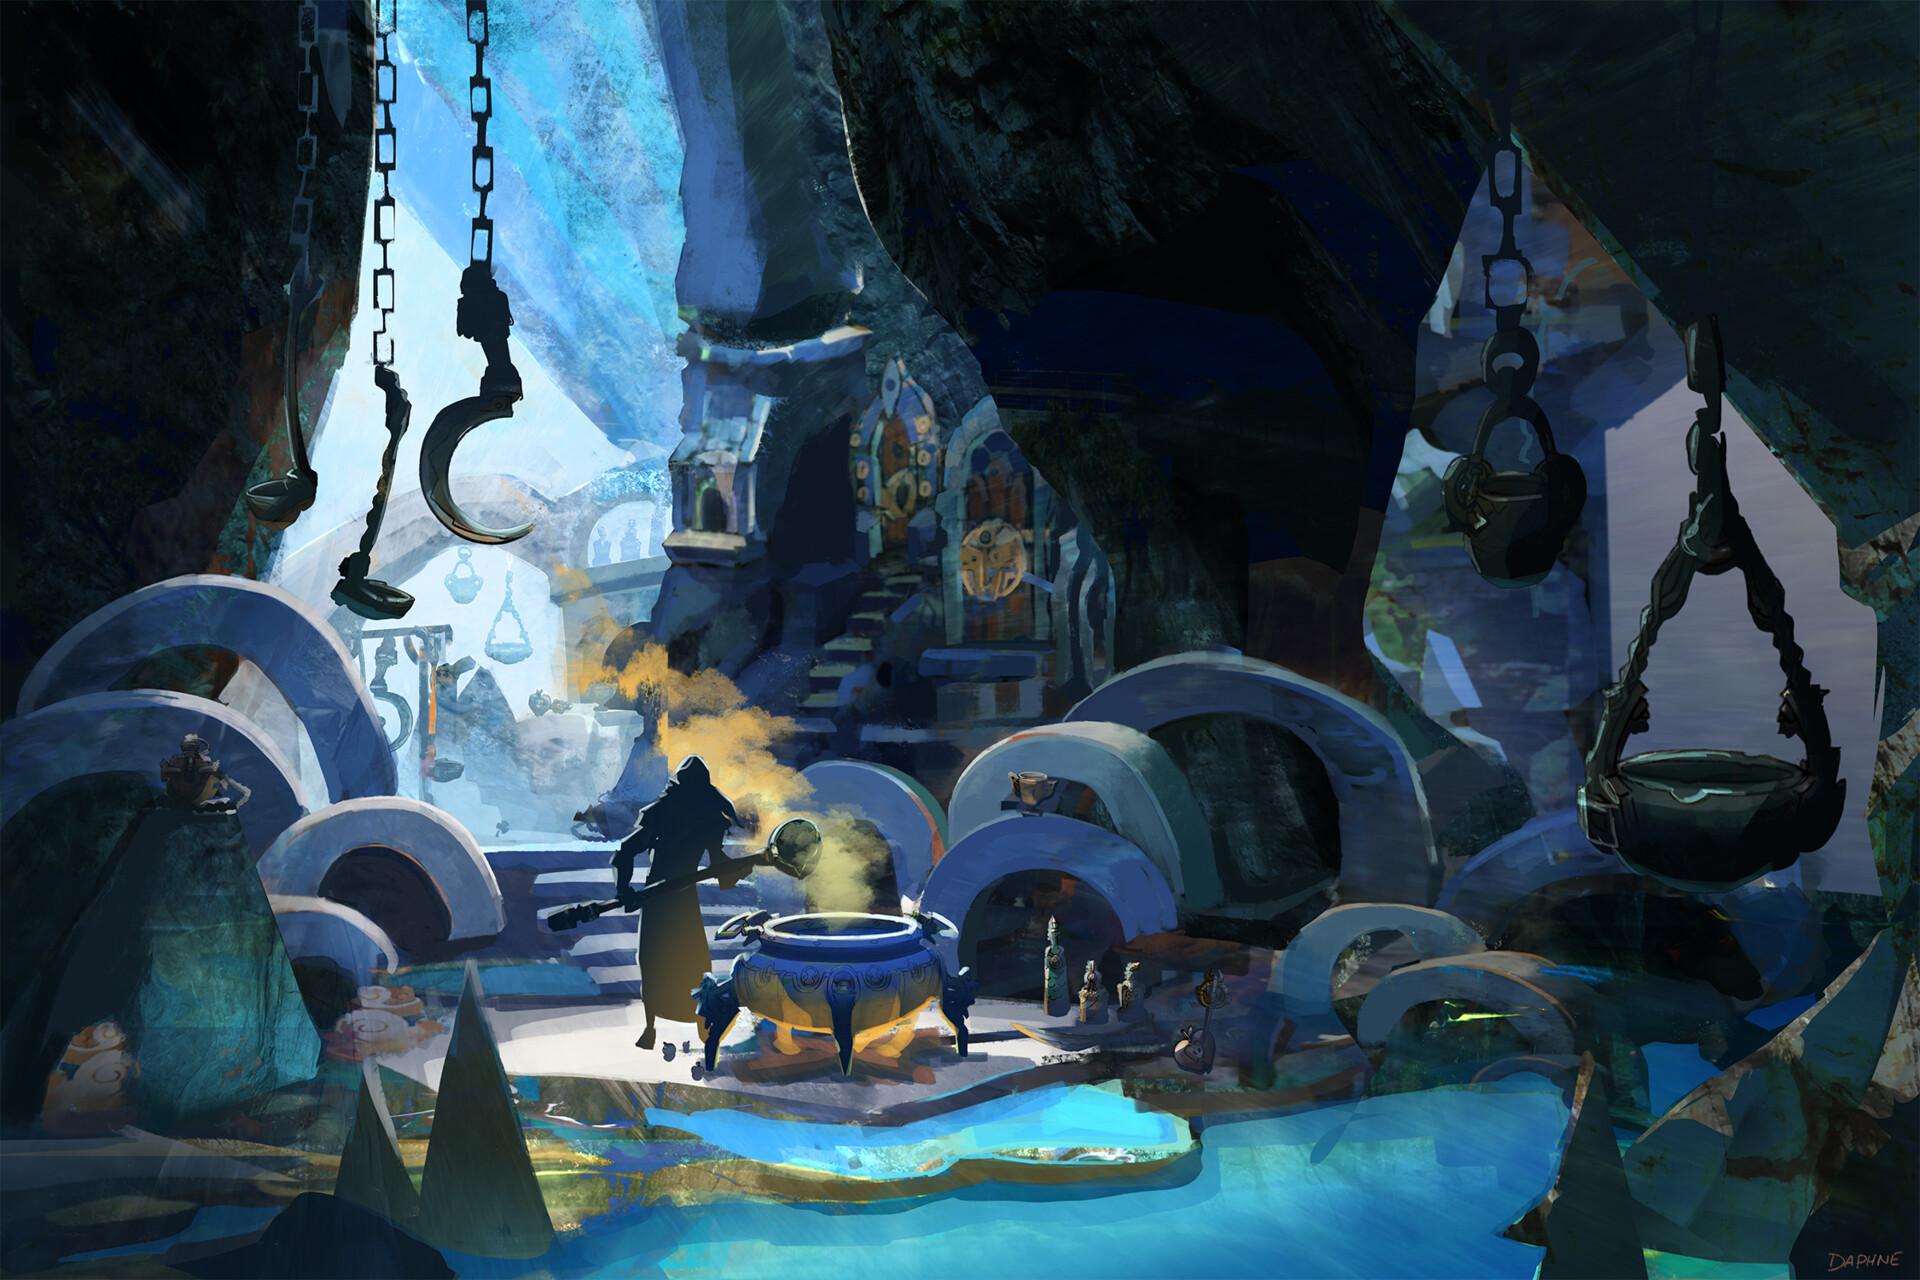 Potion Seller's Cavern